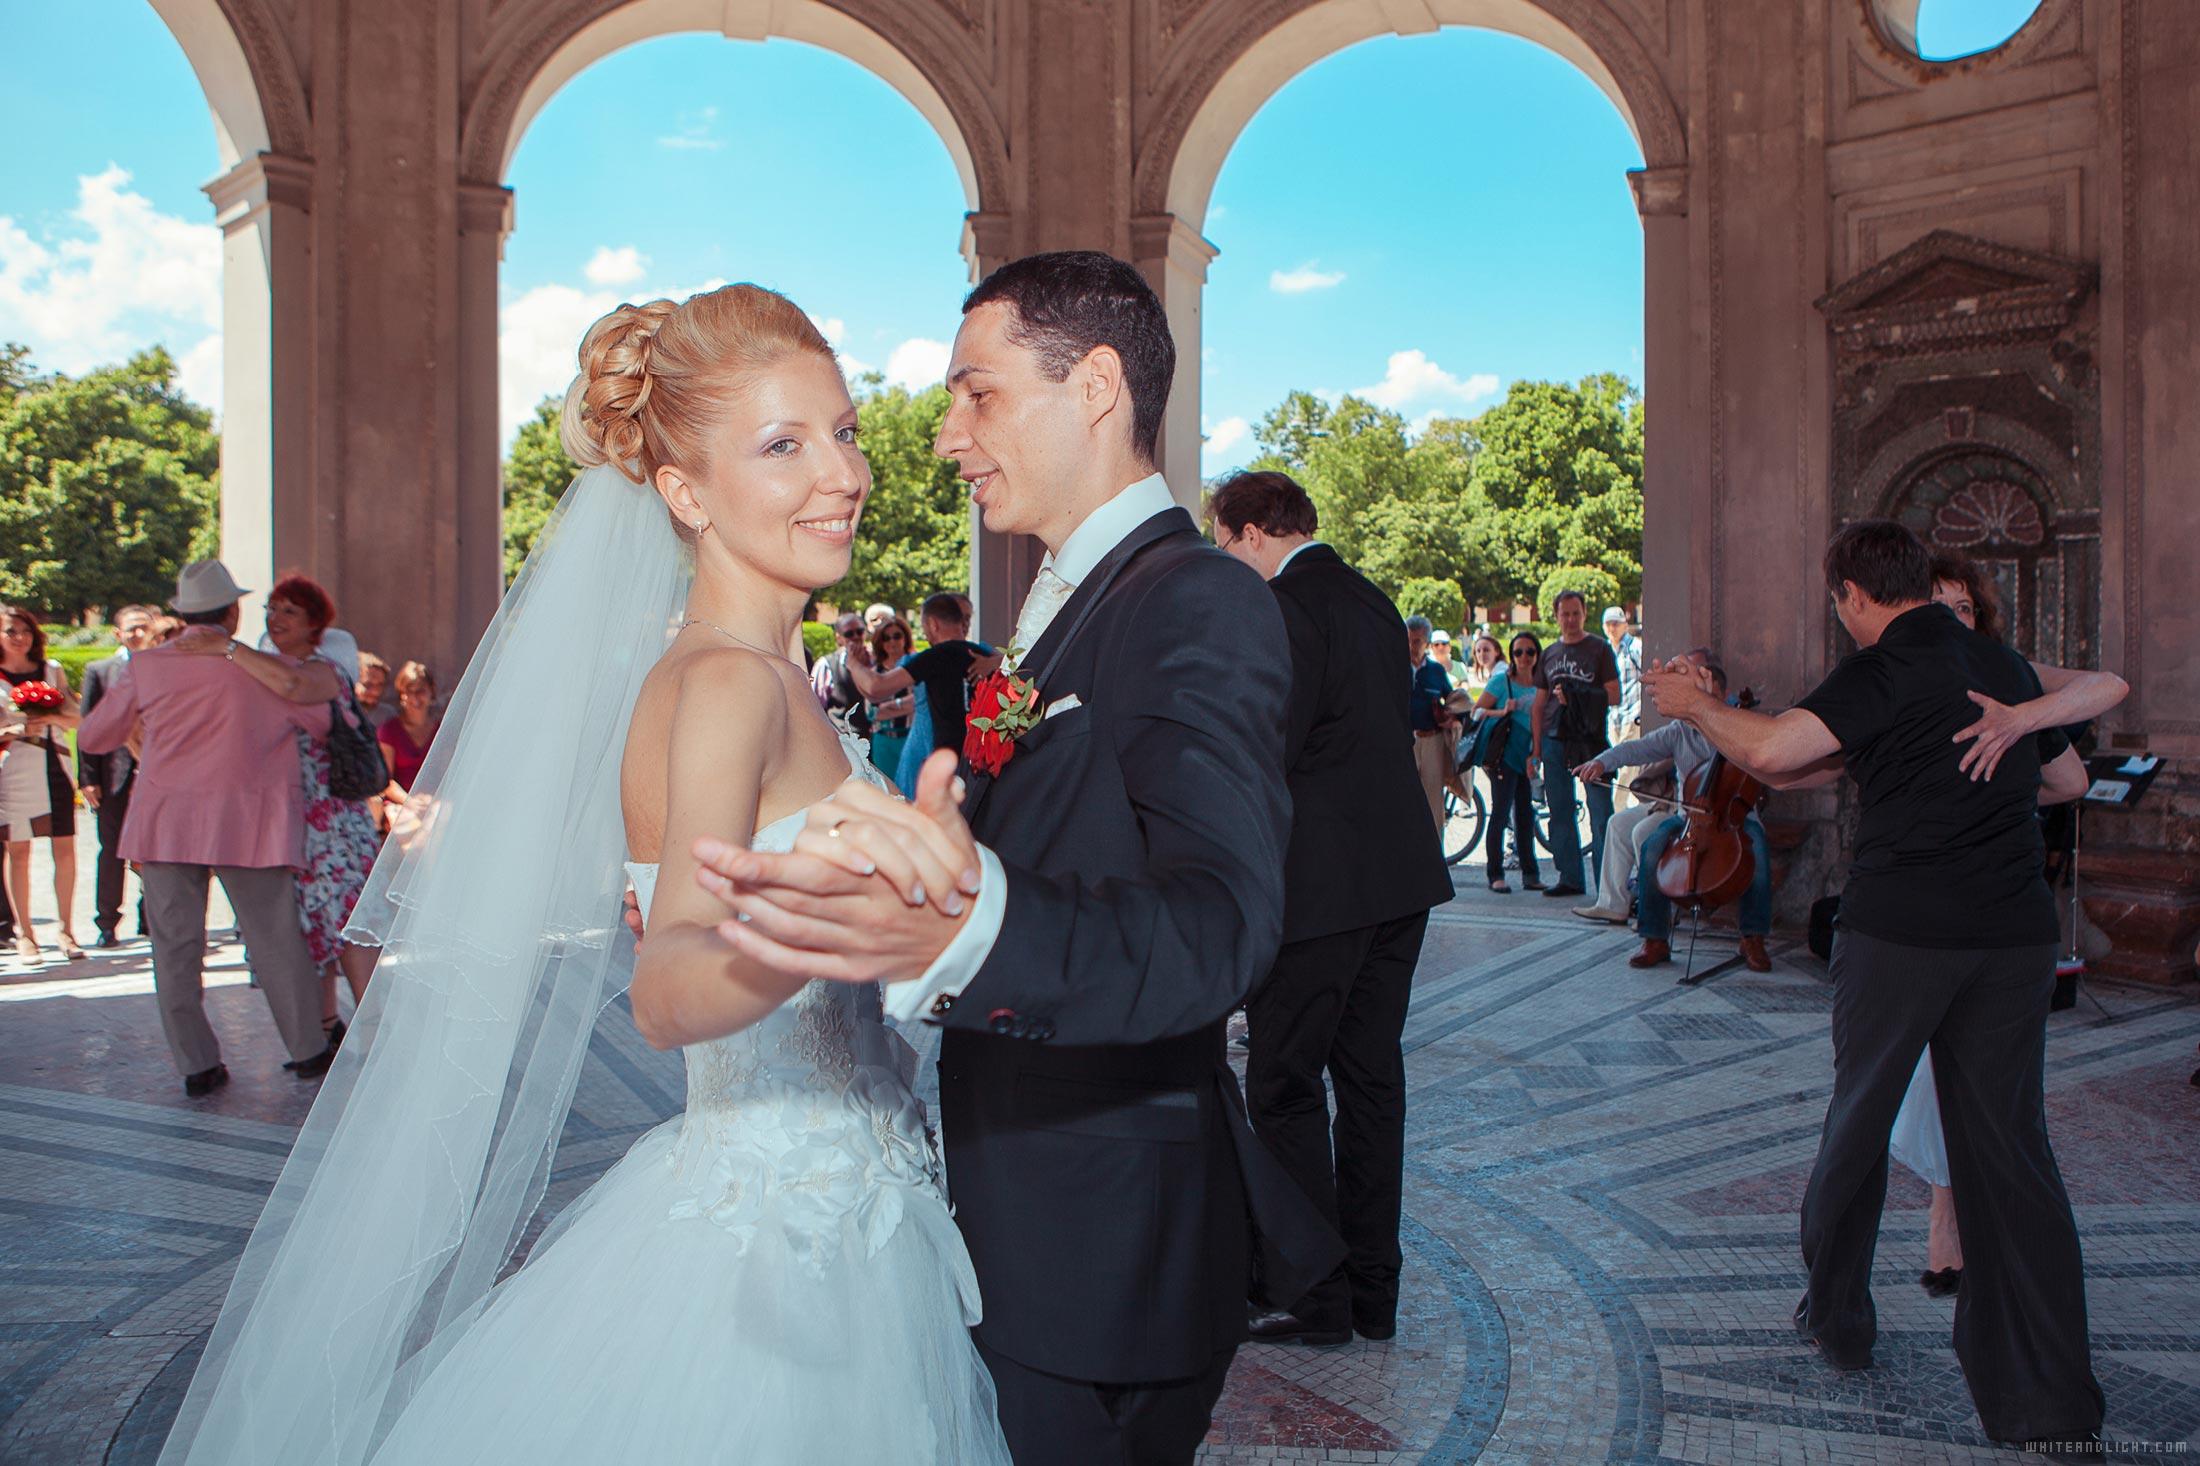 Wedding photographer Blog - weddingceremony